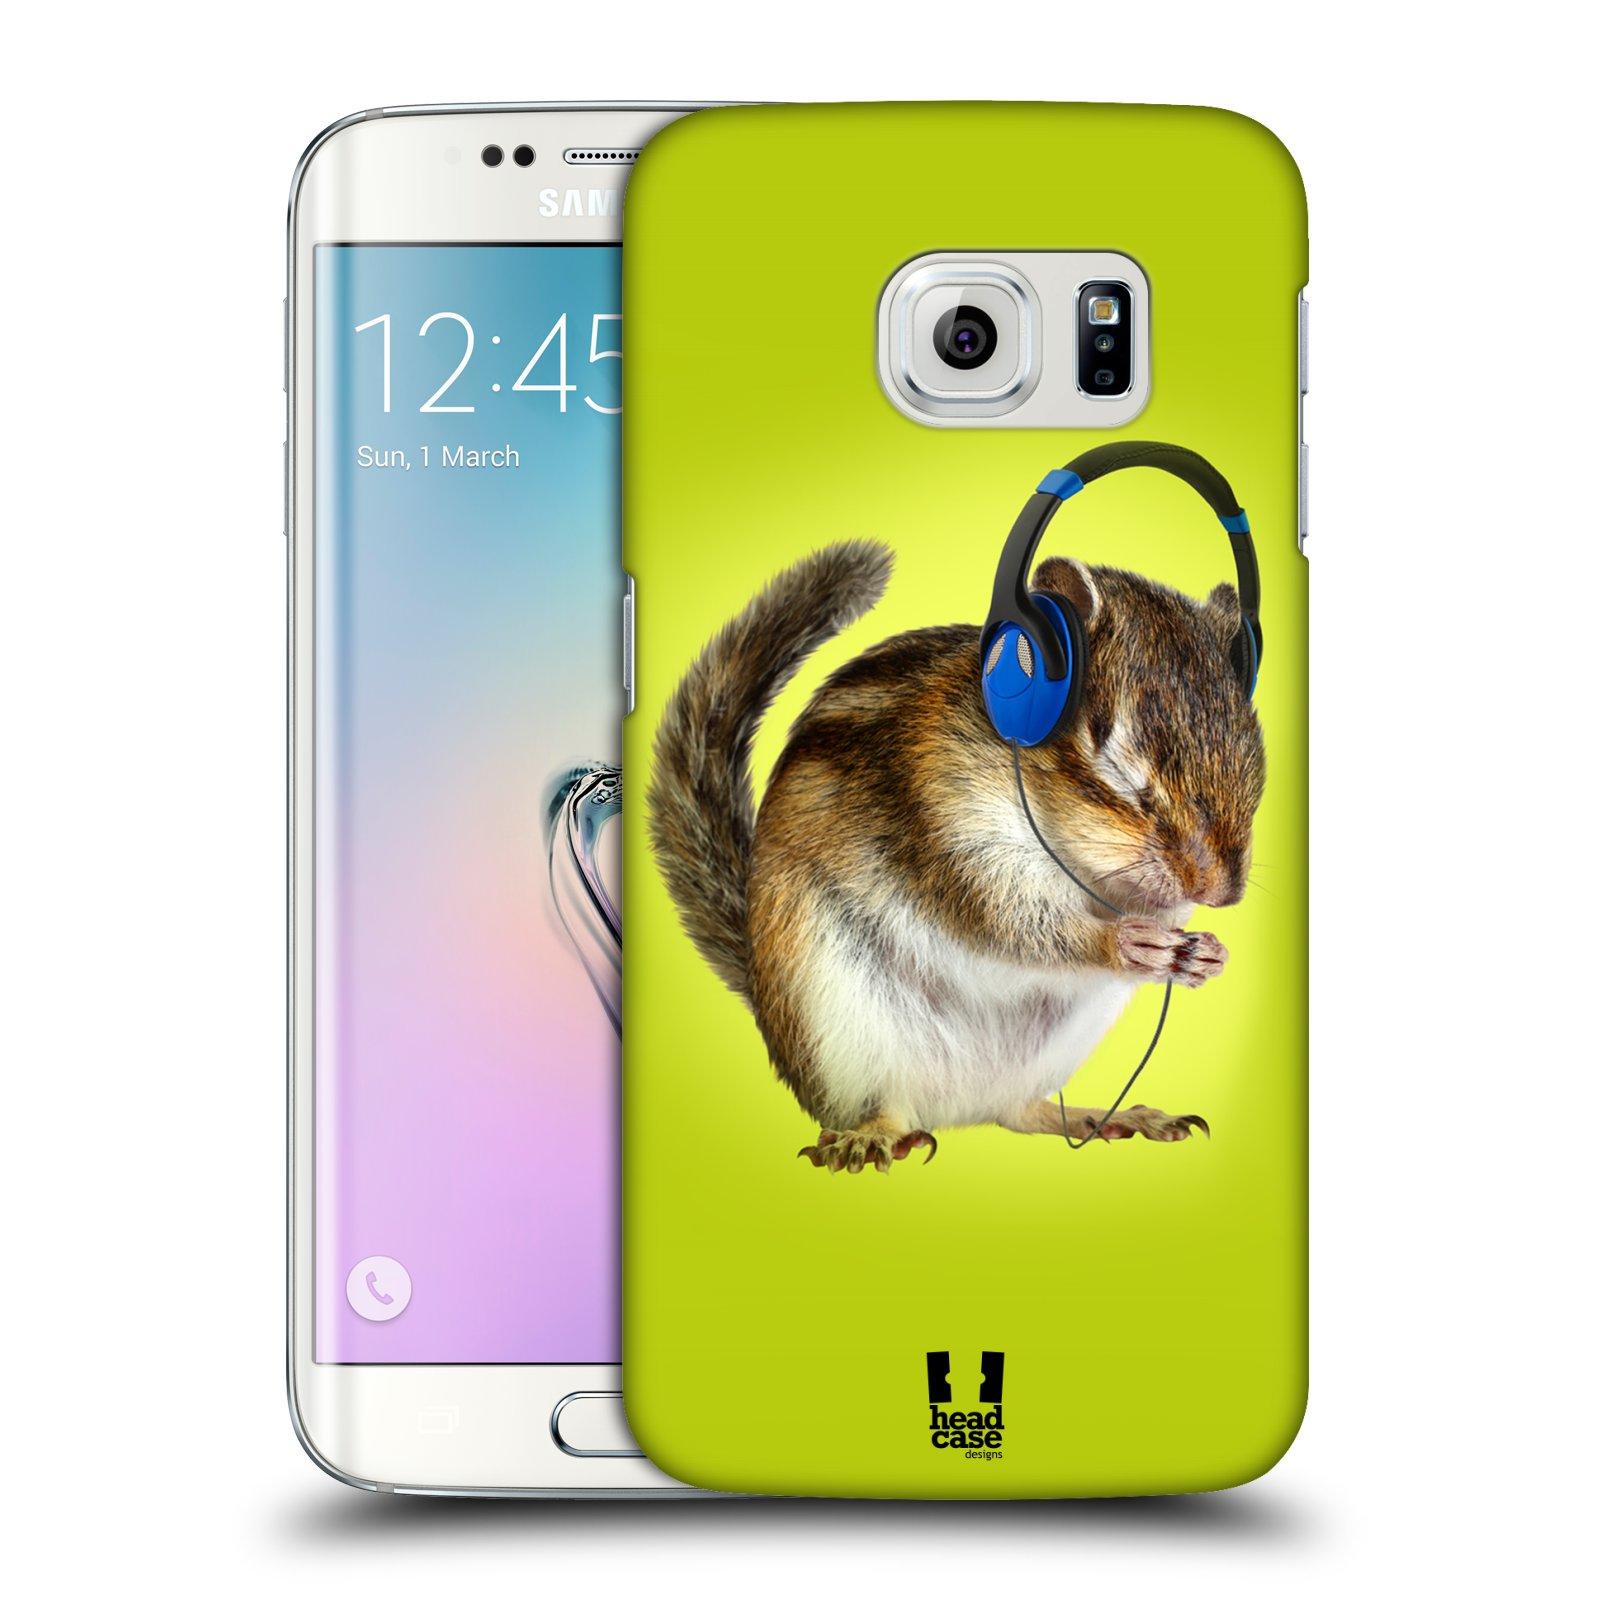 HEAD CASE plastový obal na mobil SAMSUNG Galaxy S6 EDGE (G9250, G925, G925F) vzor Legrační zvířátka veverka se sluchátky